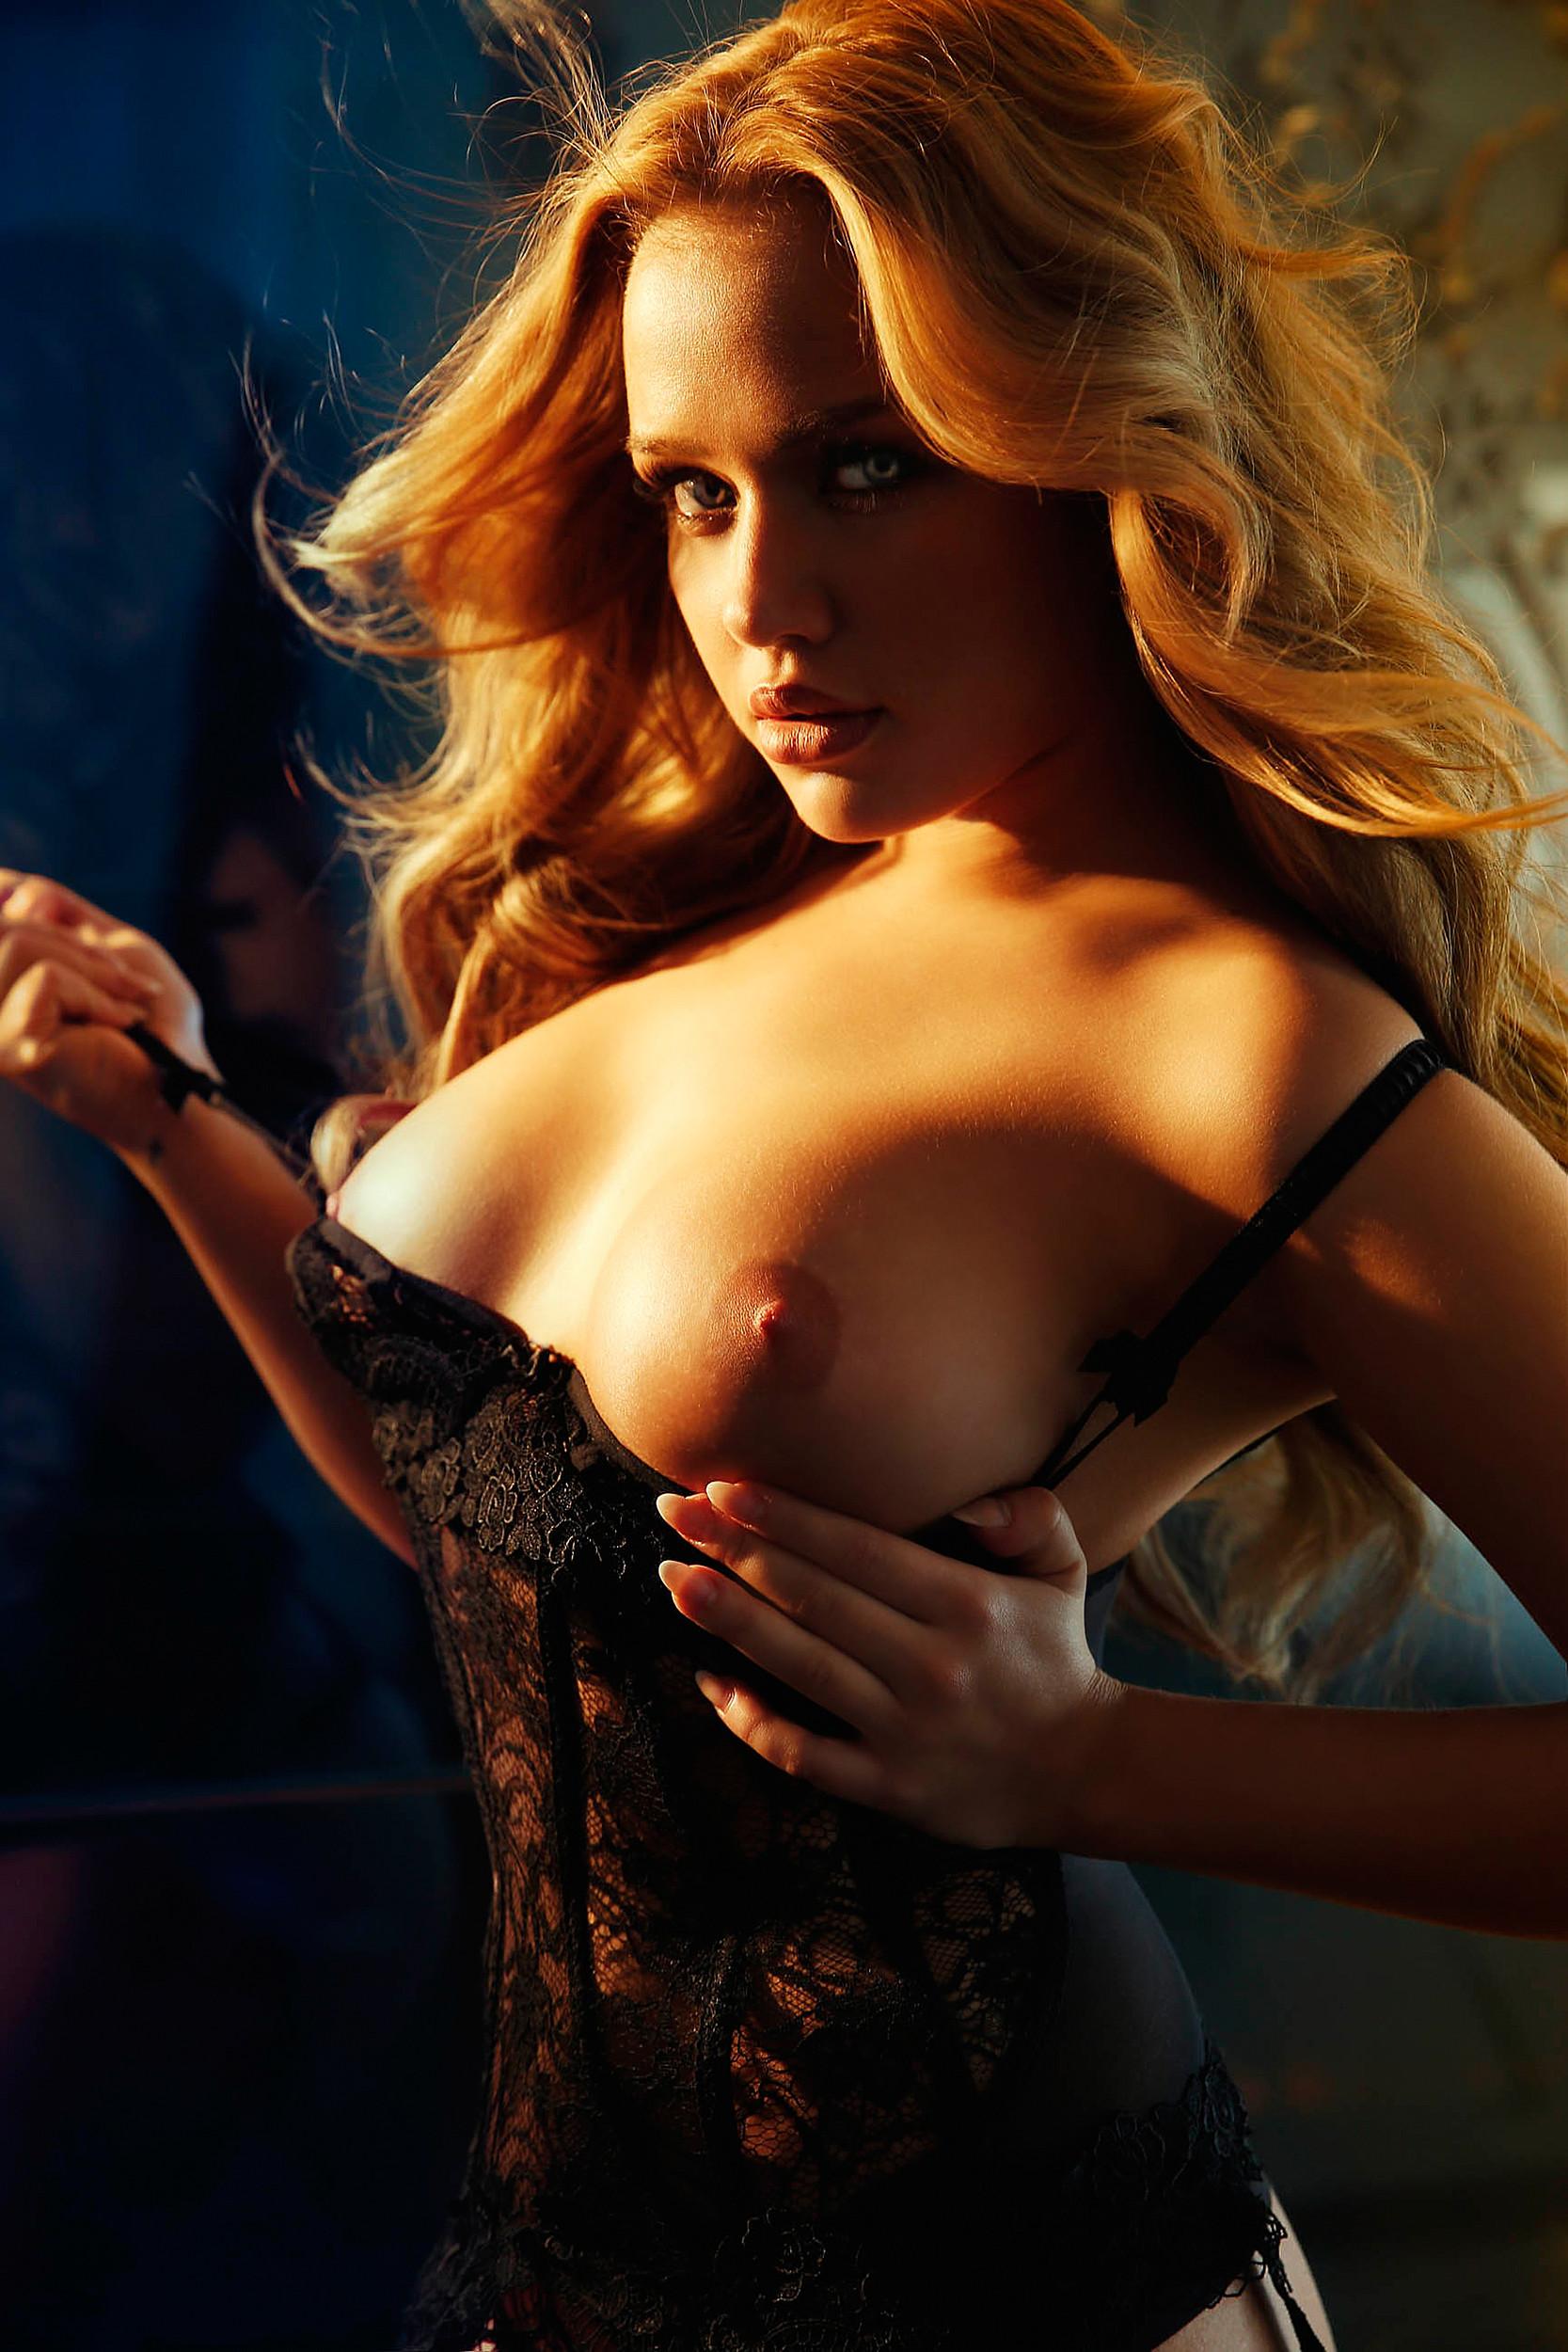 Kim Gloss Nude Photos and Videos